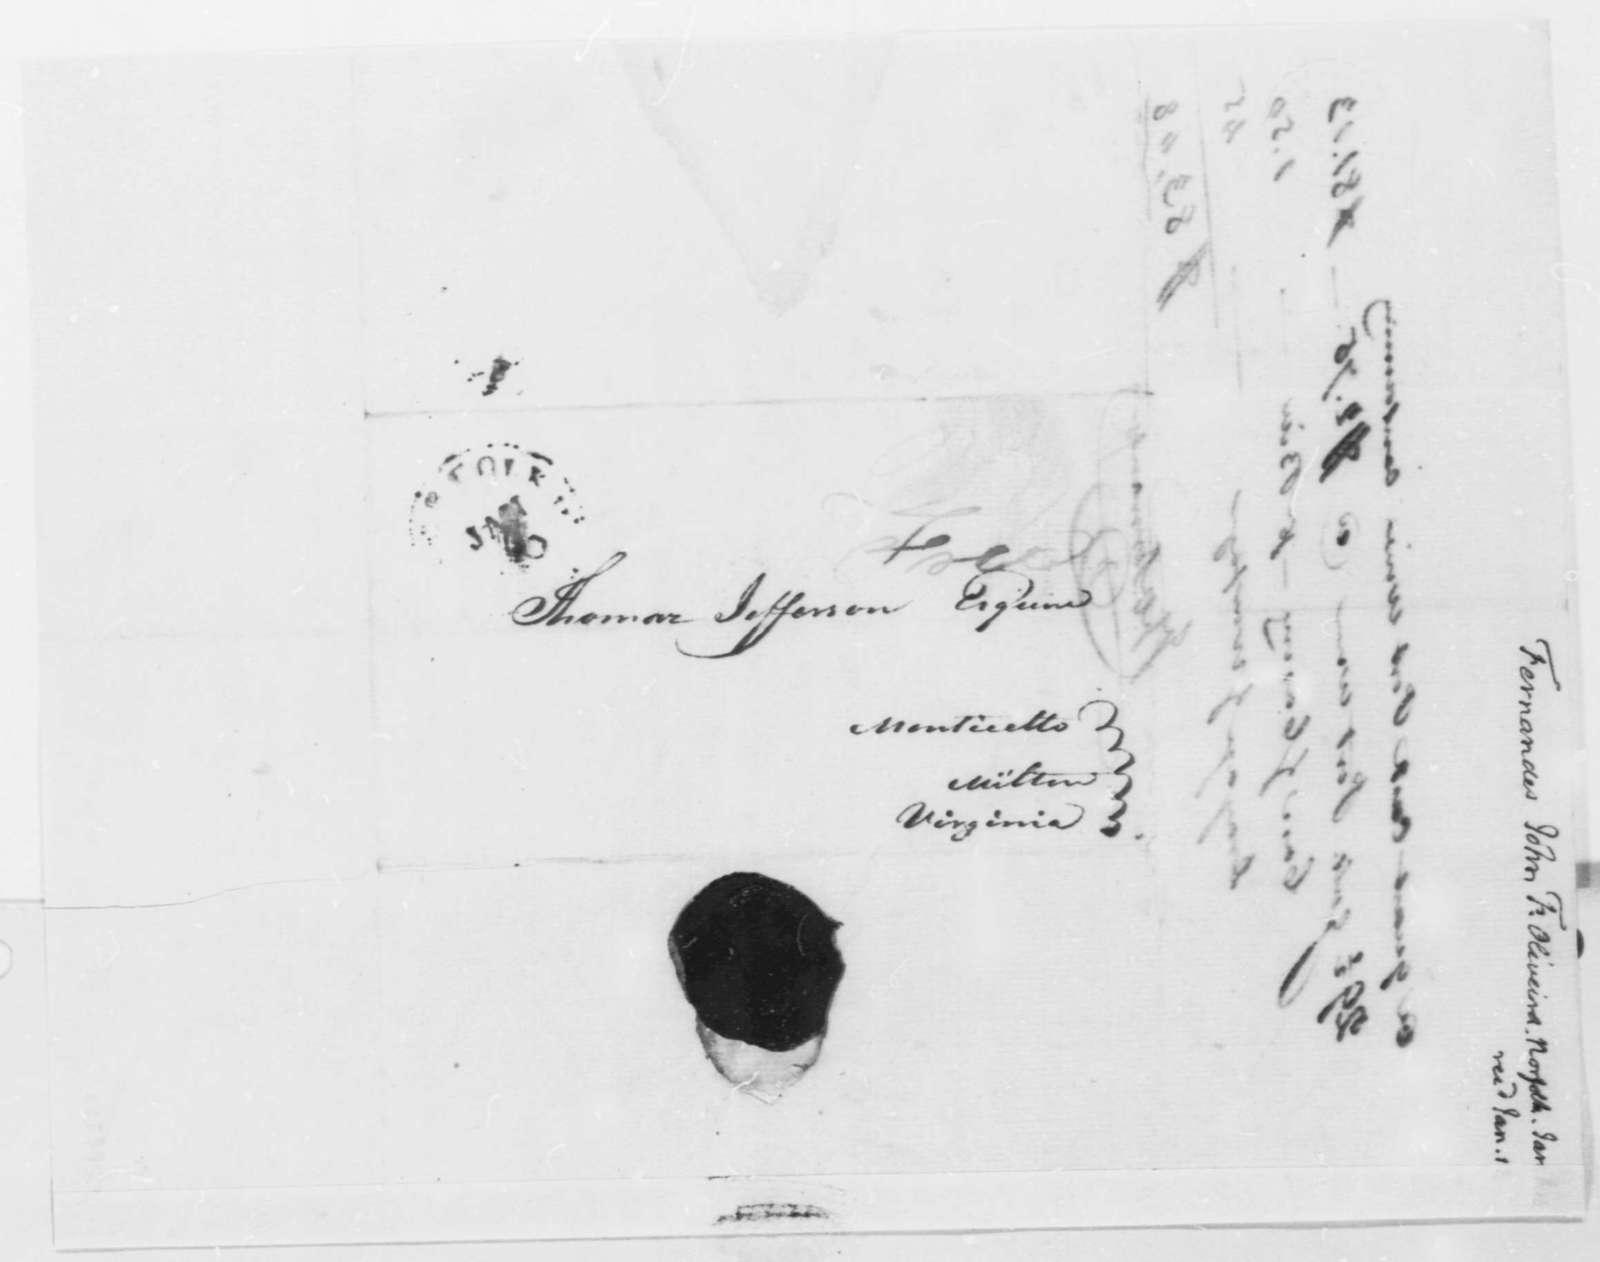 Fernandez Oliviera to Thomas Jefferson, January 6, 1816